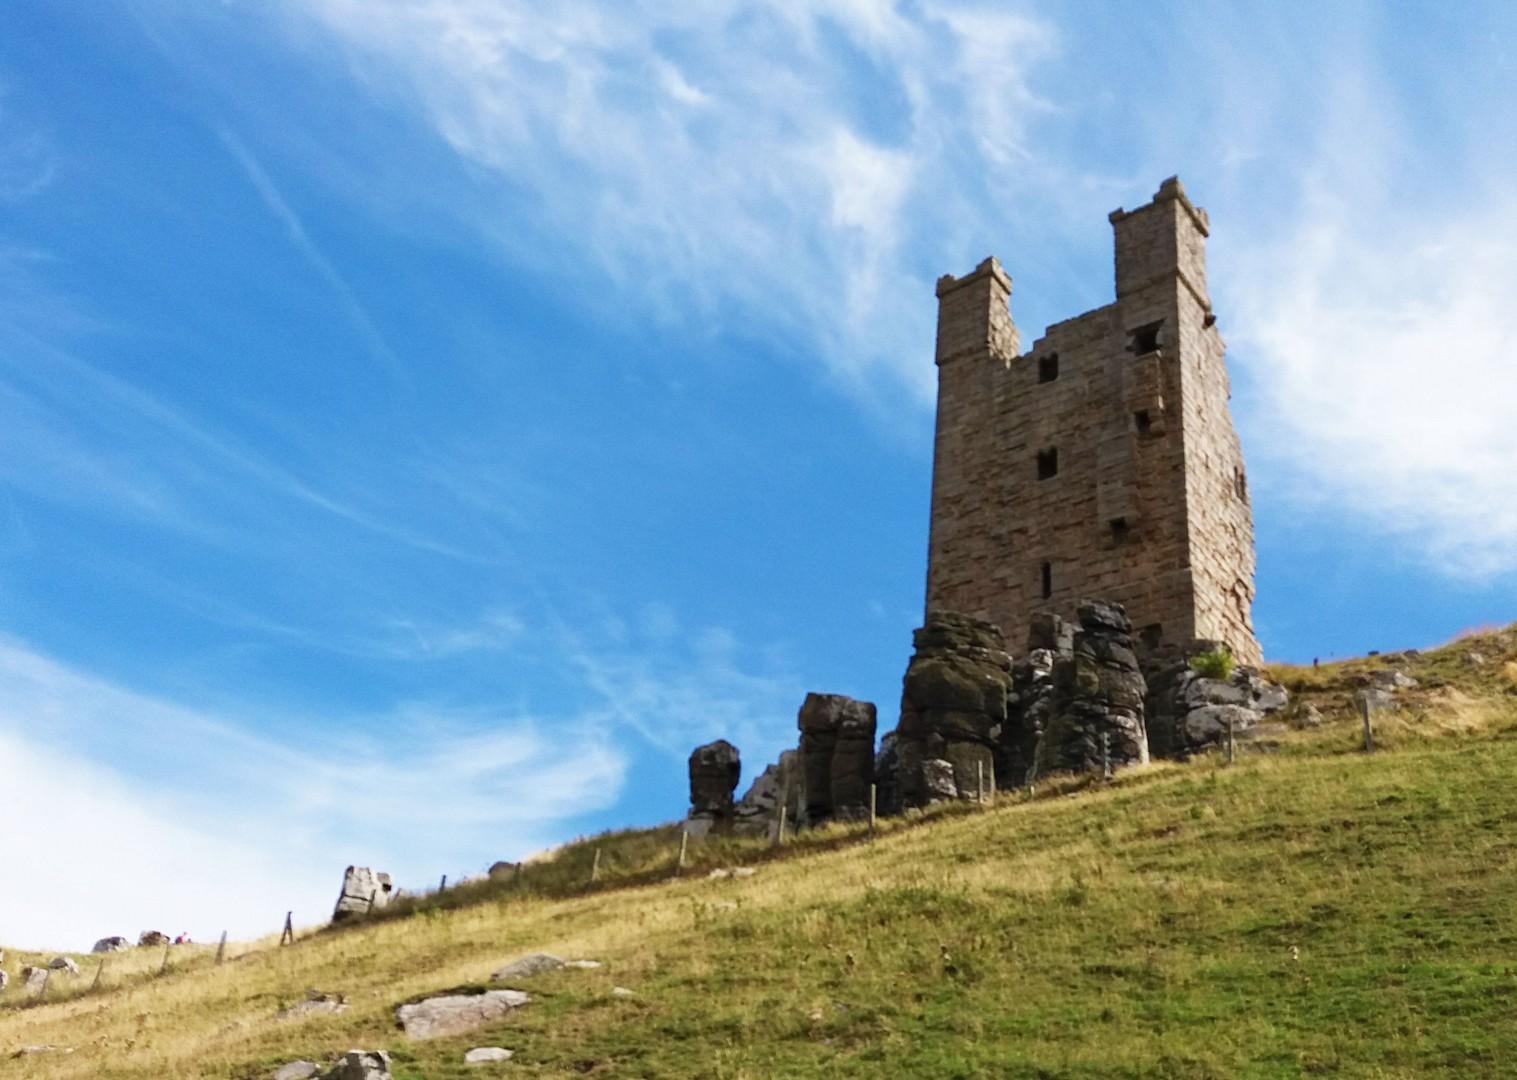 20180811_125047.jpg - UK - Coast and Castles - 4 Days Cycling - Self-Guided Leisure Cycling Holiday - Leisure Cycling